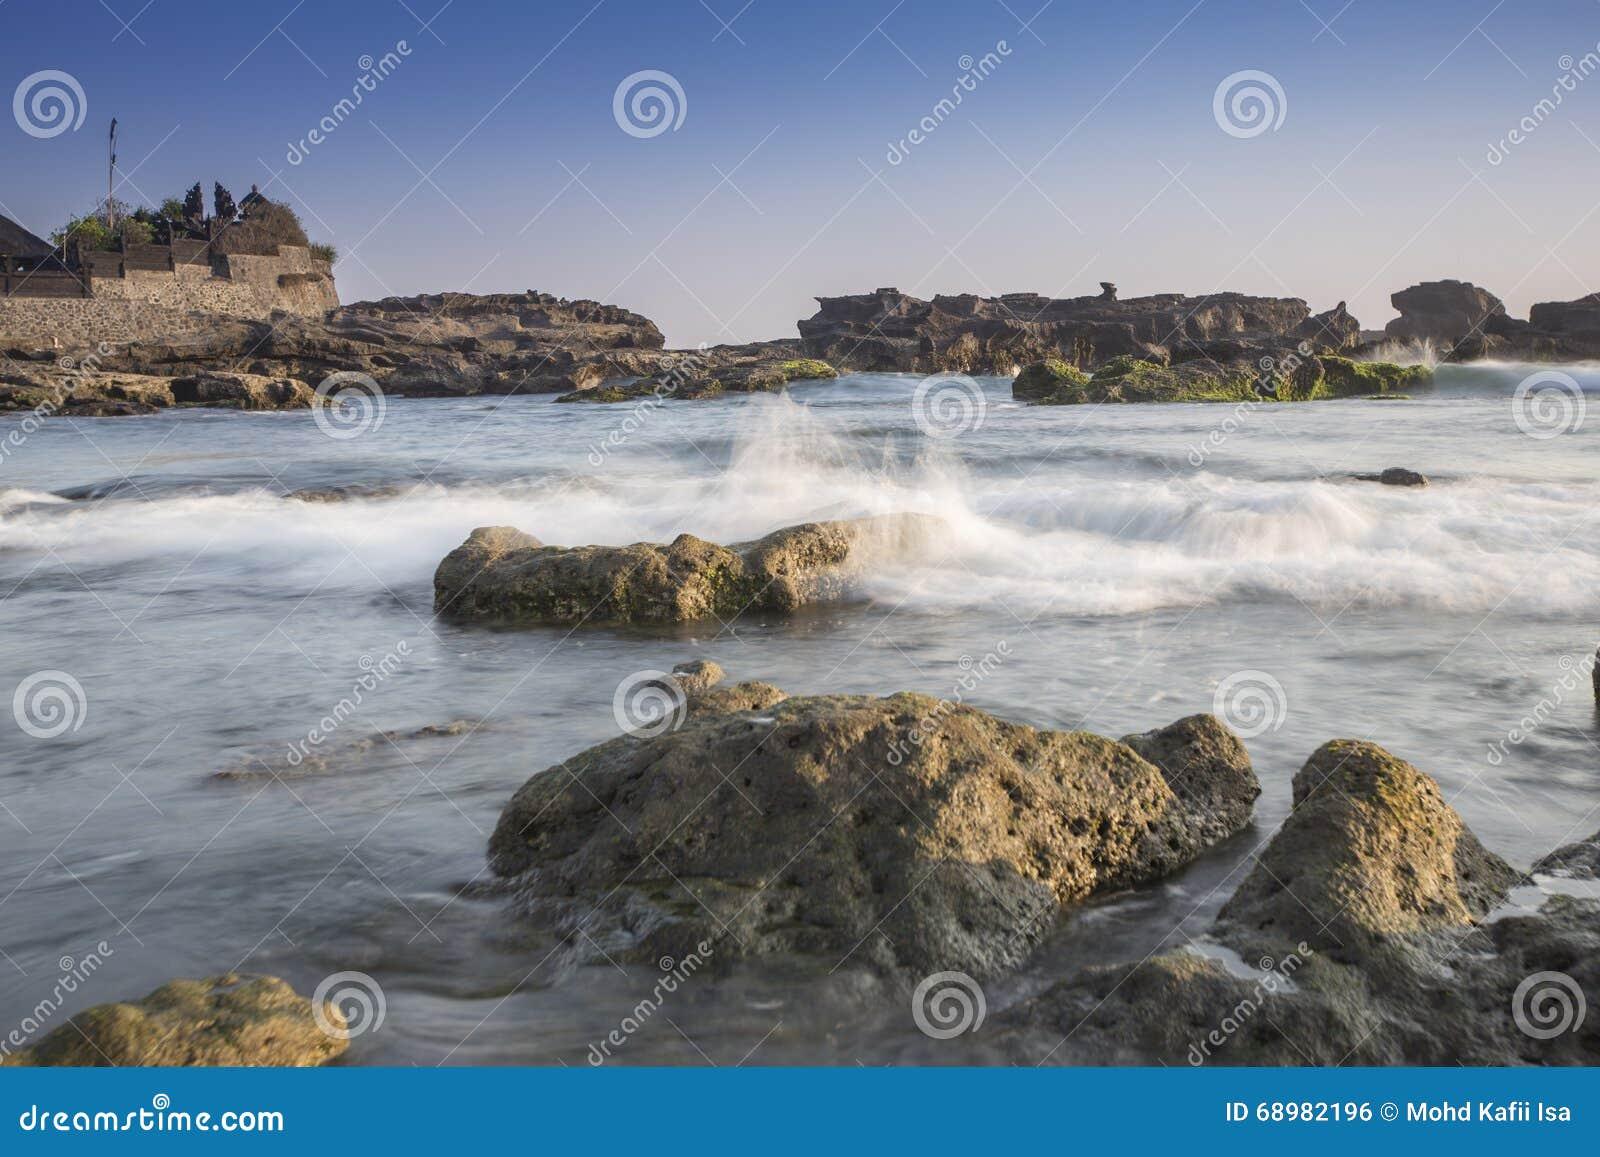 Snenic widok plaża w Bali